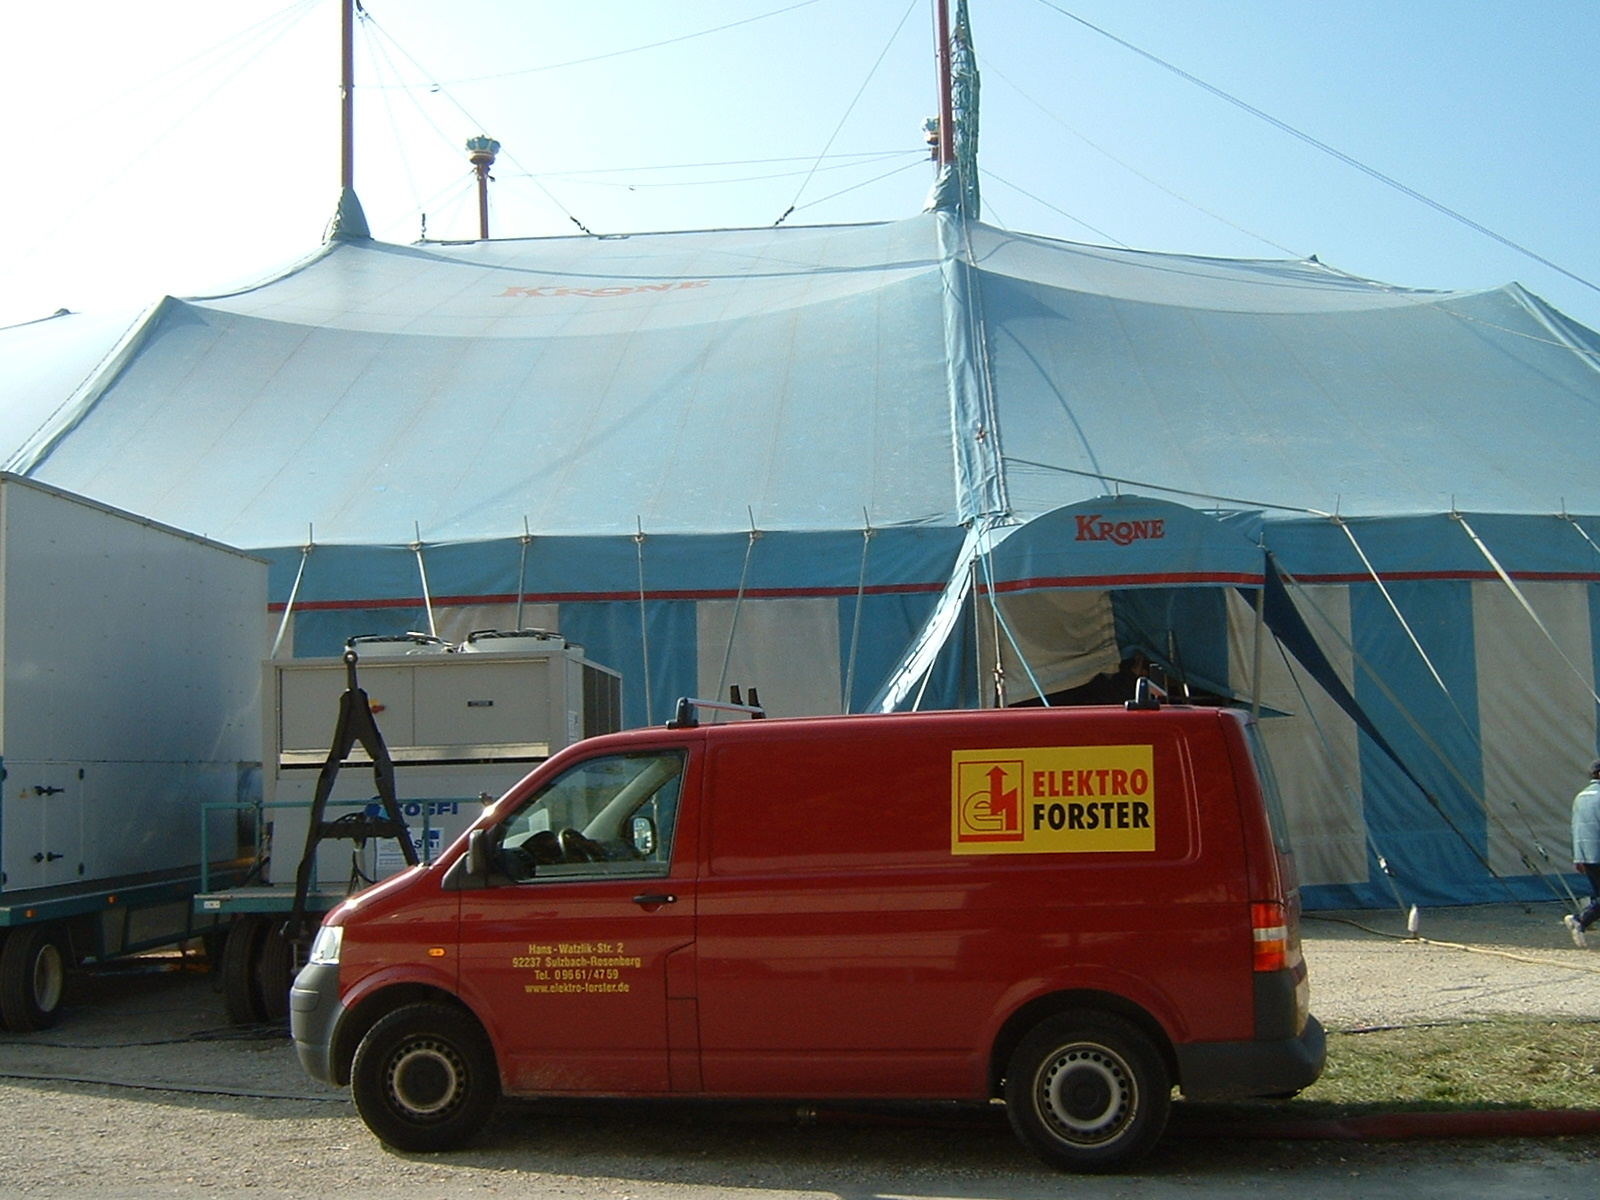 Circus Krone mit Elektro Forster